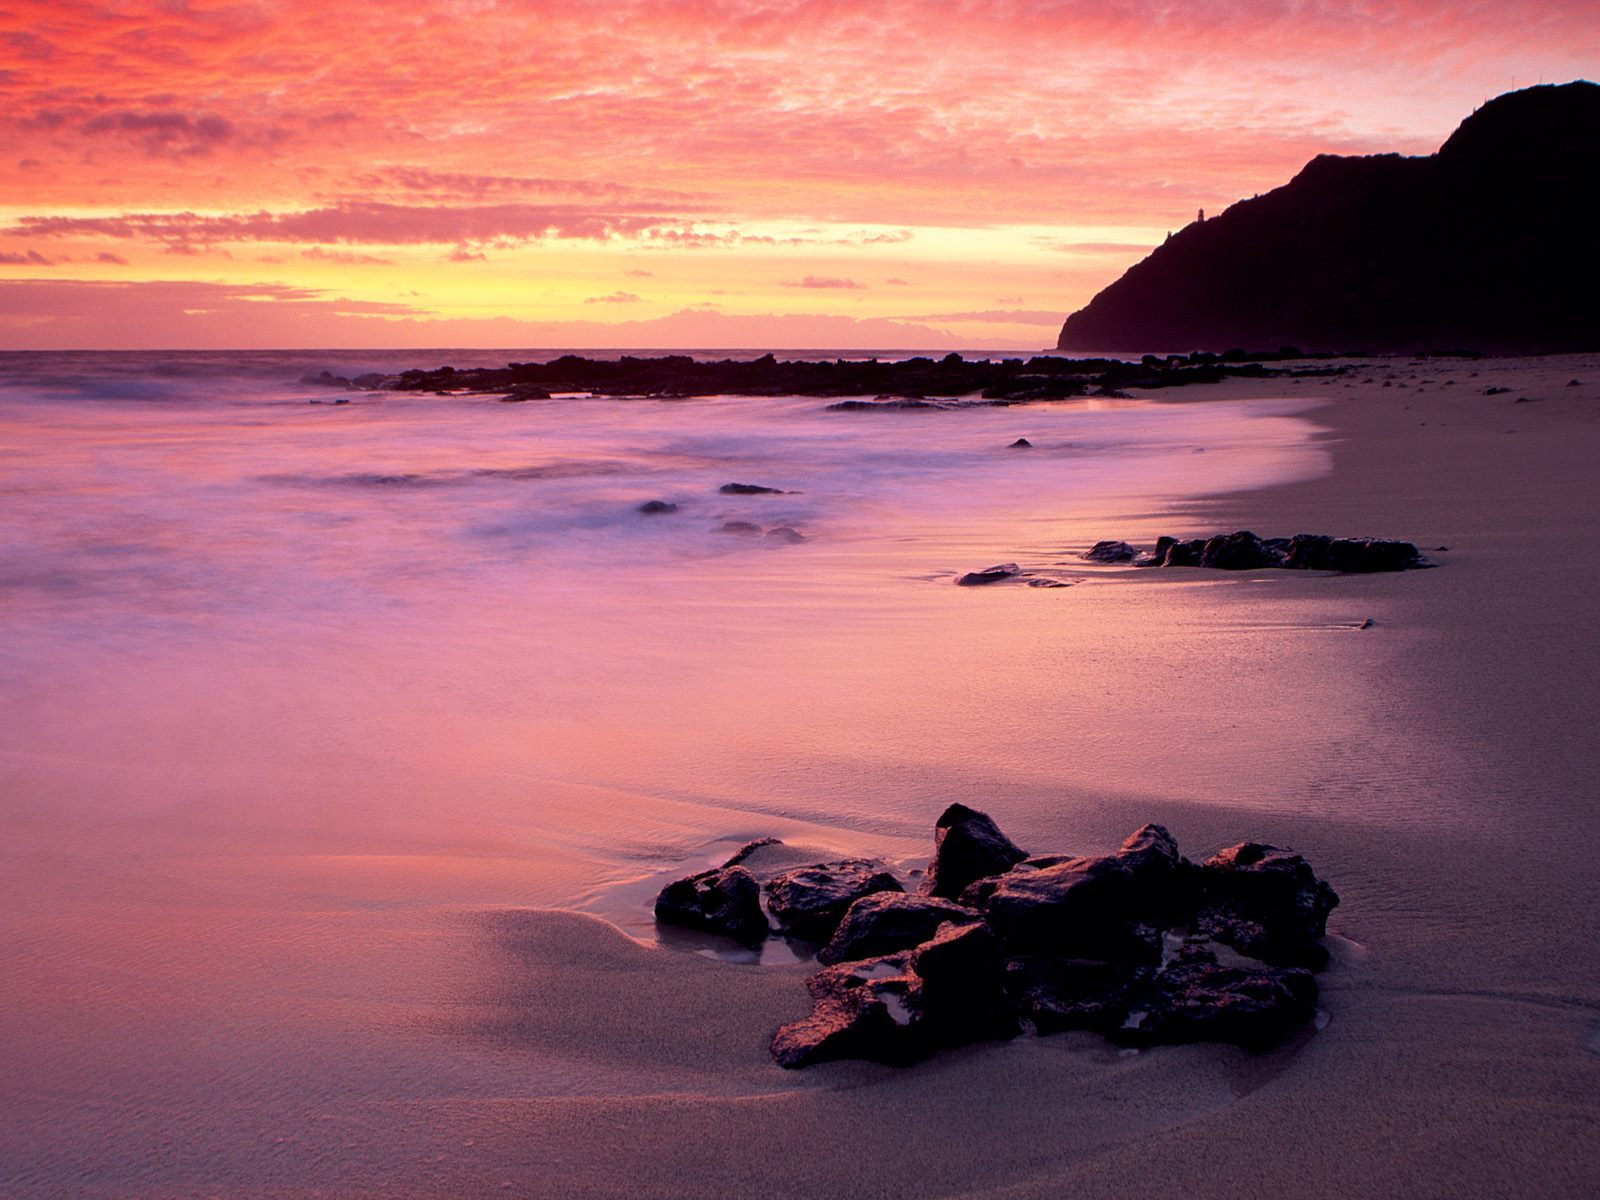 http://3.bp.blogspot.com/_e45GK4i1E8M/TRW_UEWujII/AAAAAAAACWk/IK9lVMwfHII/s1600/Makapuu_Beach_Park_Oahu_Hawaii.jpg